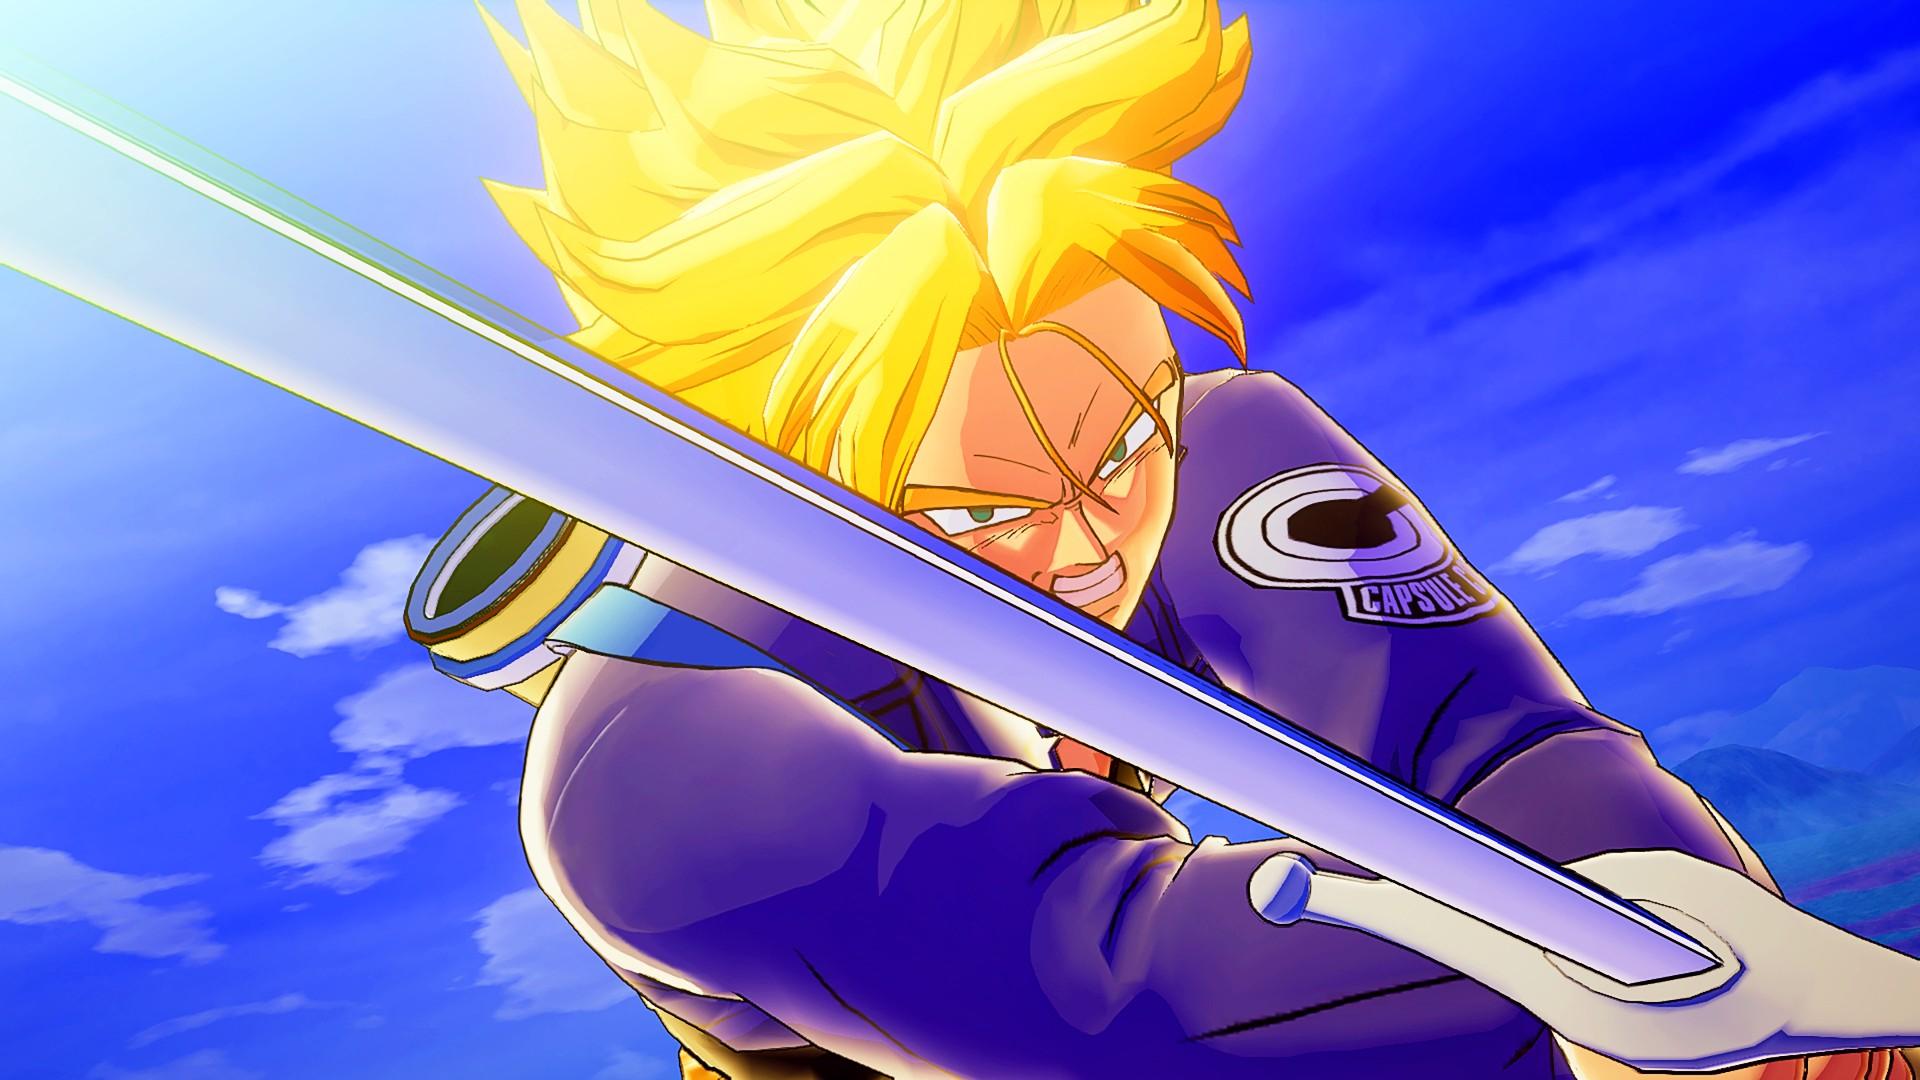 Dragon Ball Z: Kakarot's Trunks DLC releases next week